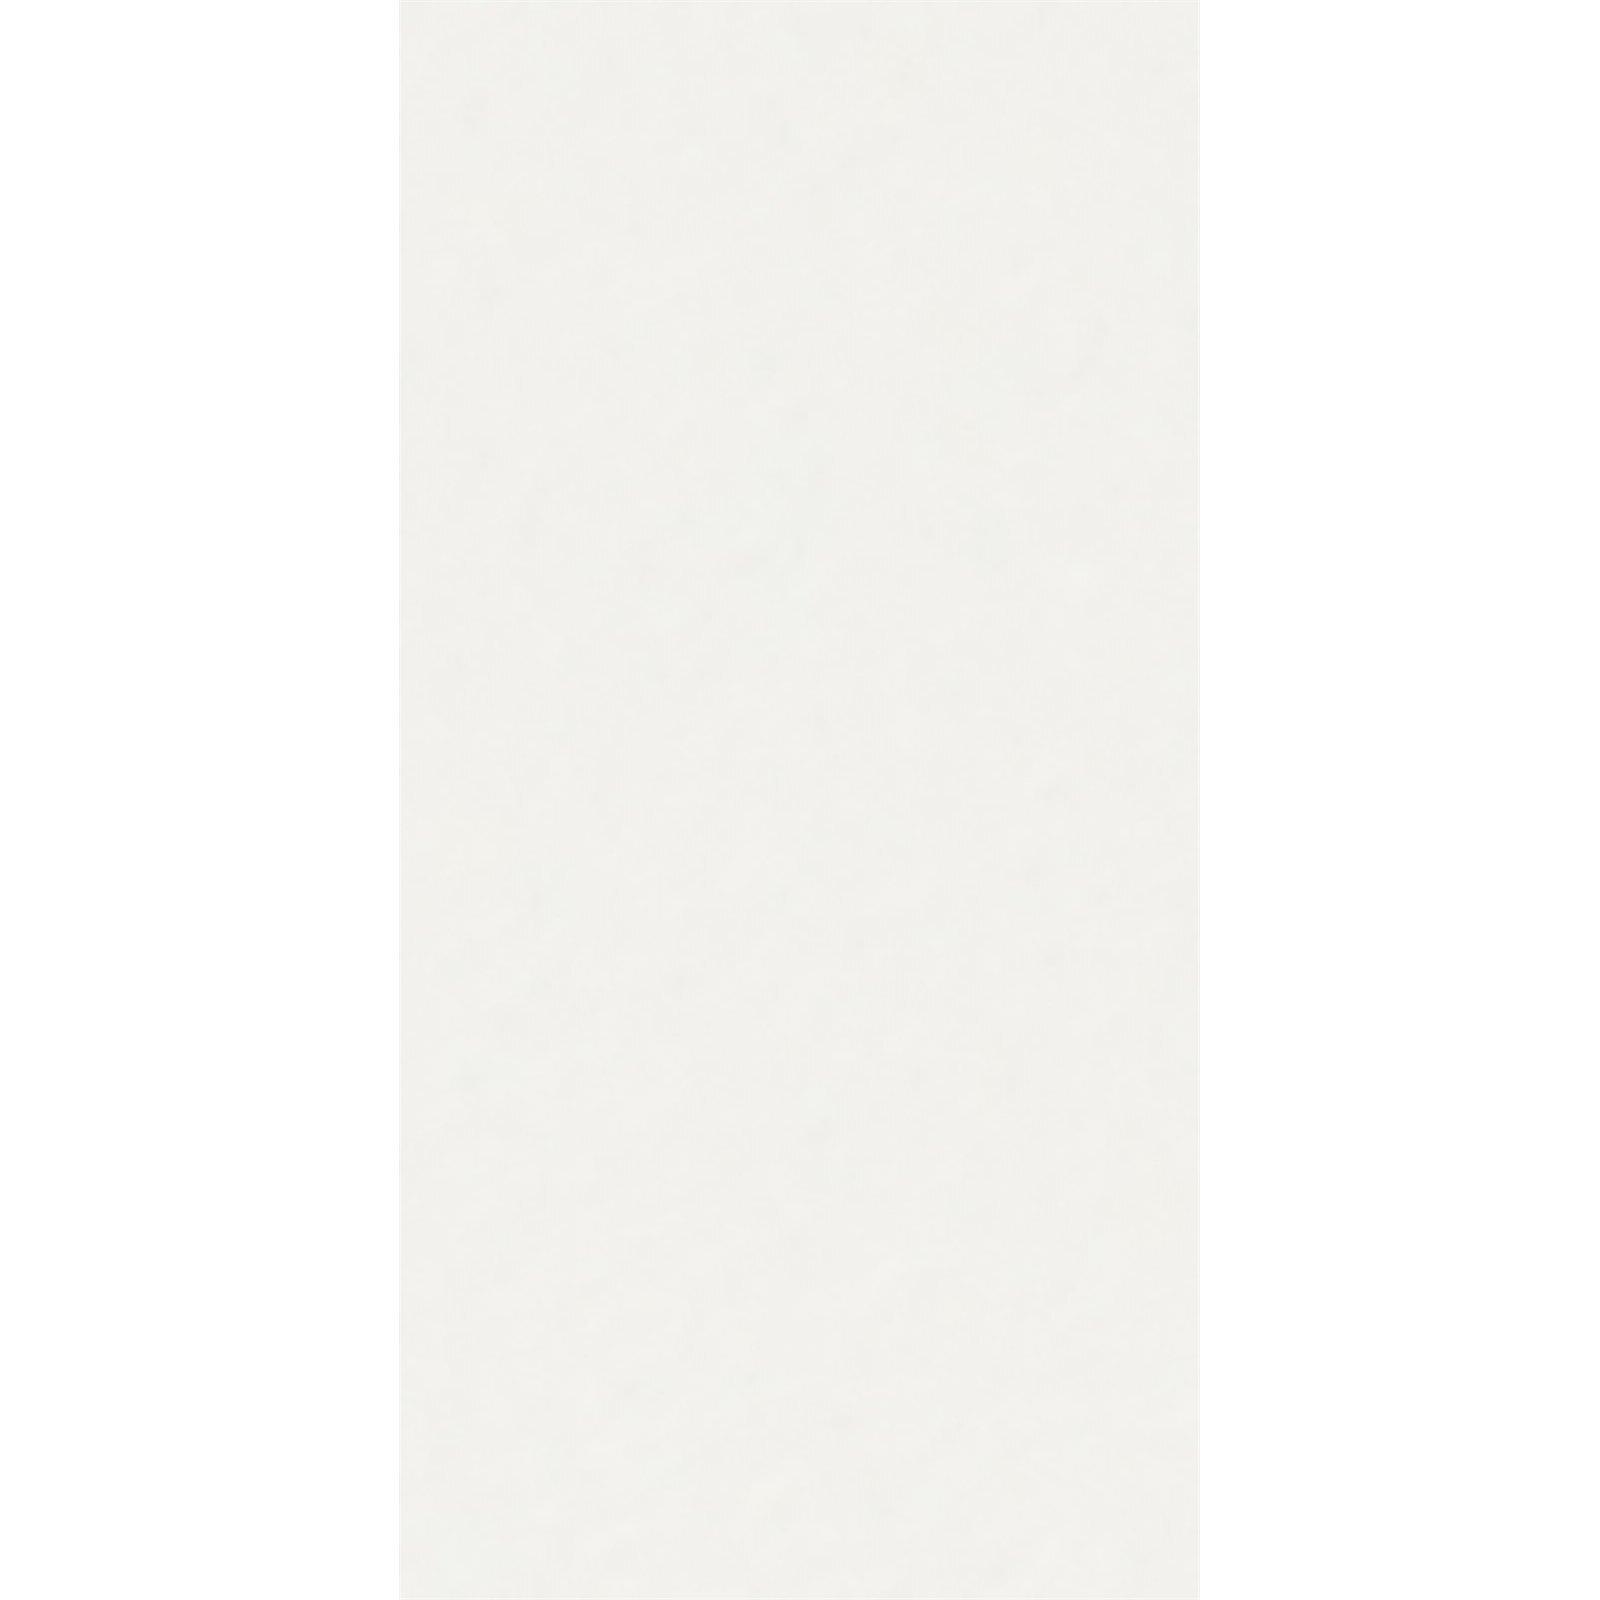 Bestwood 9mm Arctic White Gloss Double Sided Melamine MDF